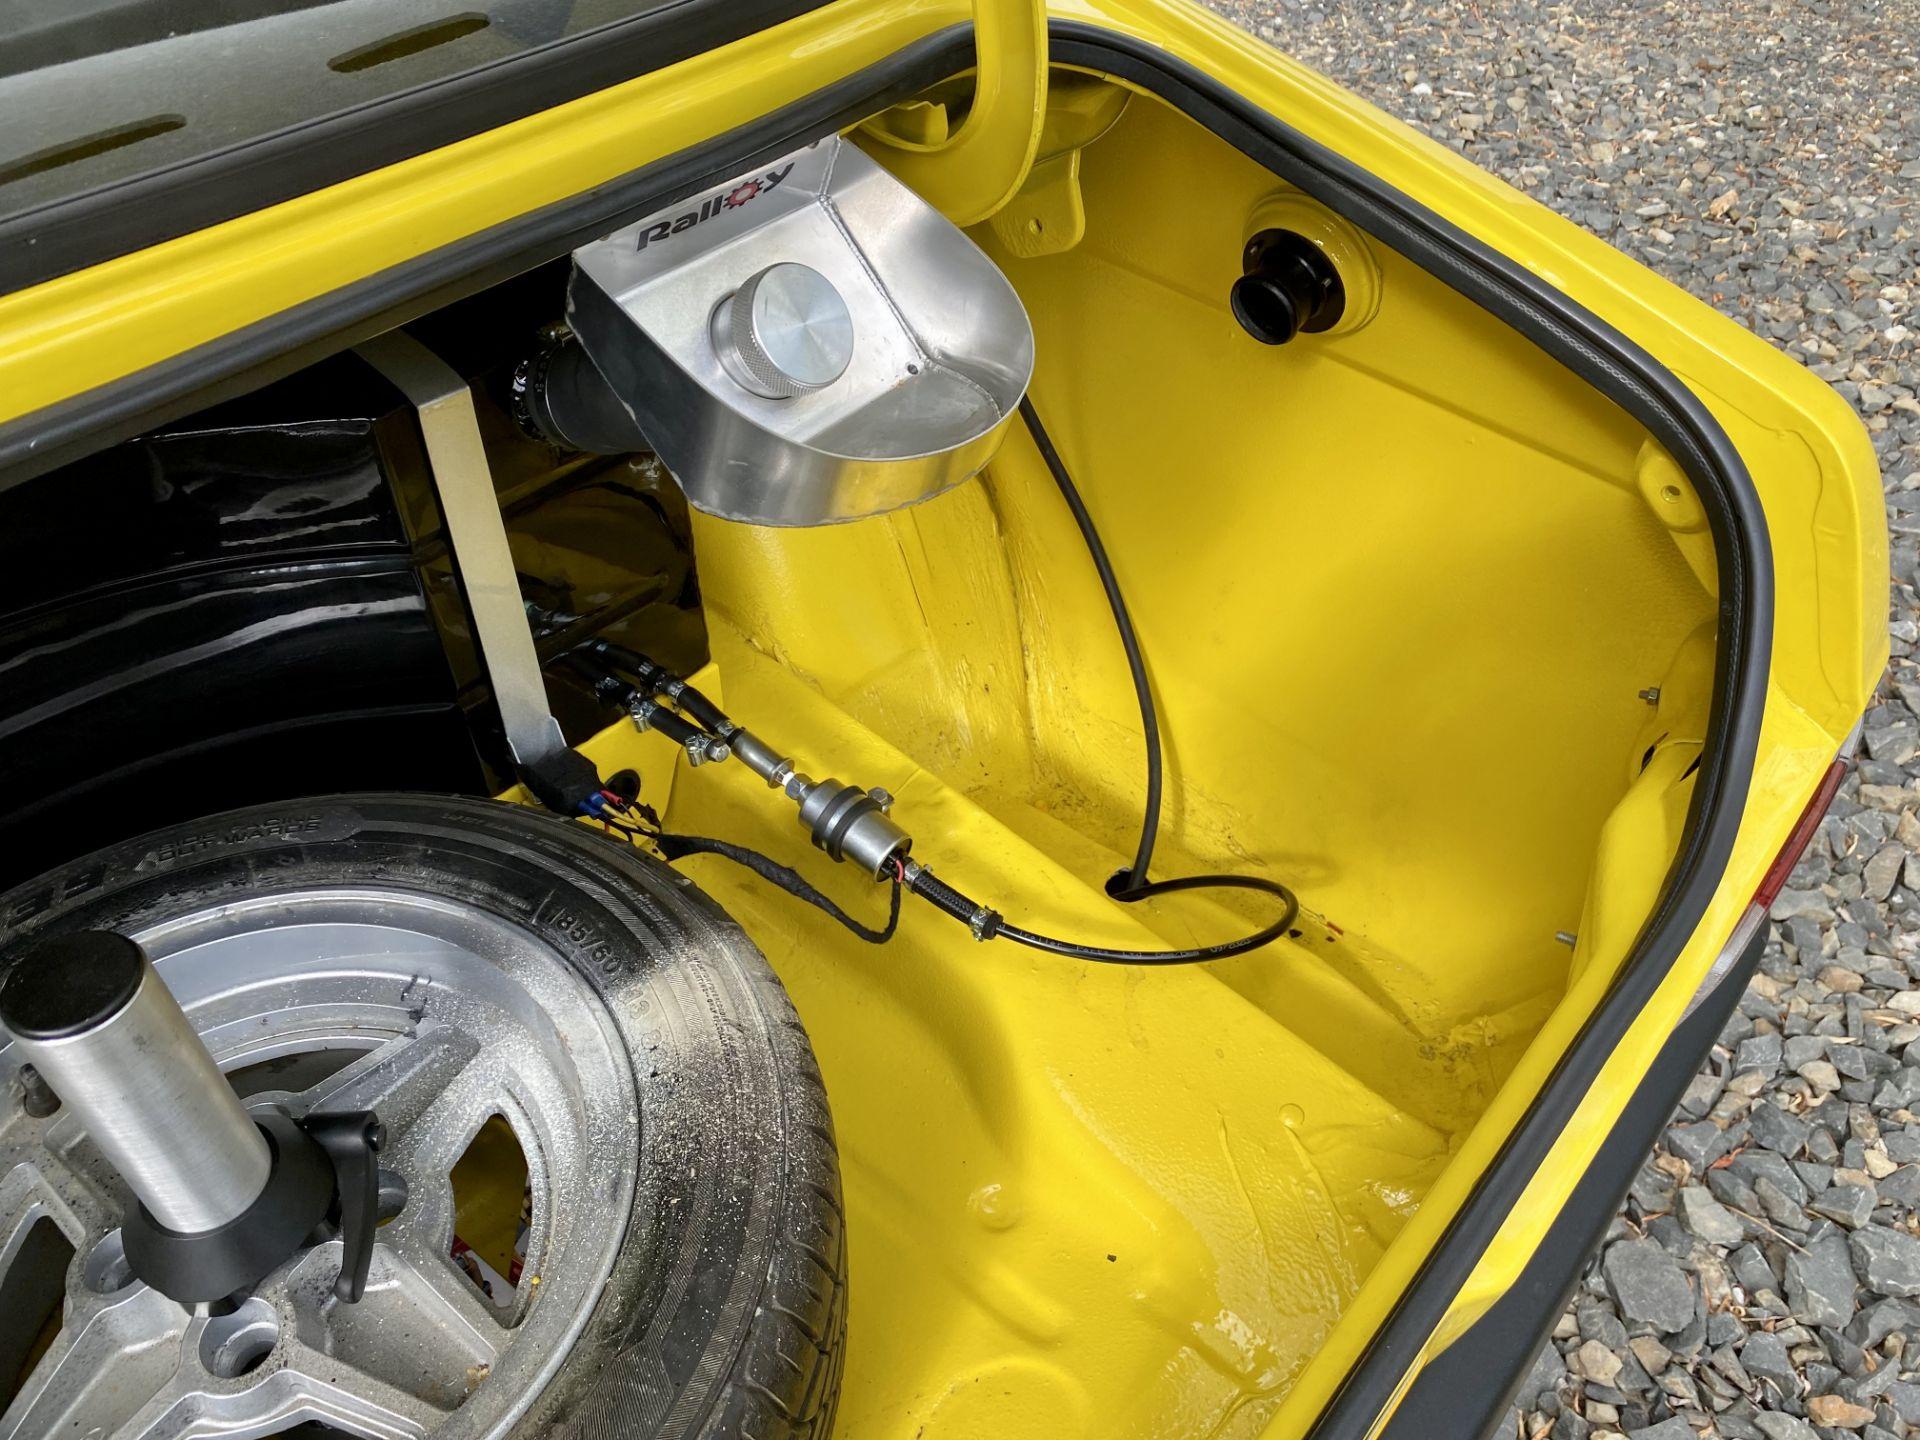 Ford Escort MK2 - Image 51 of 58